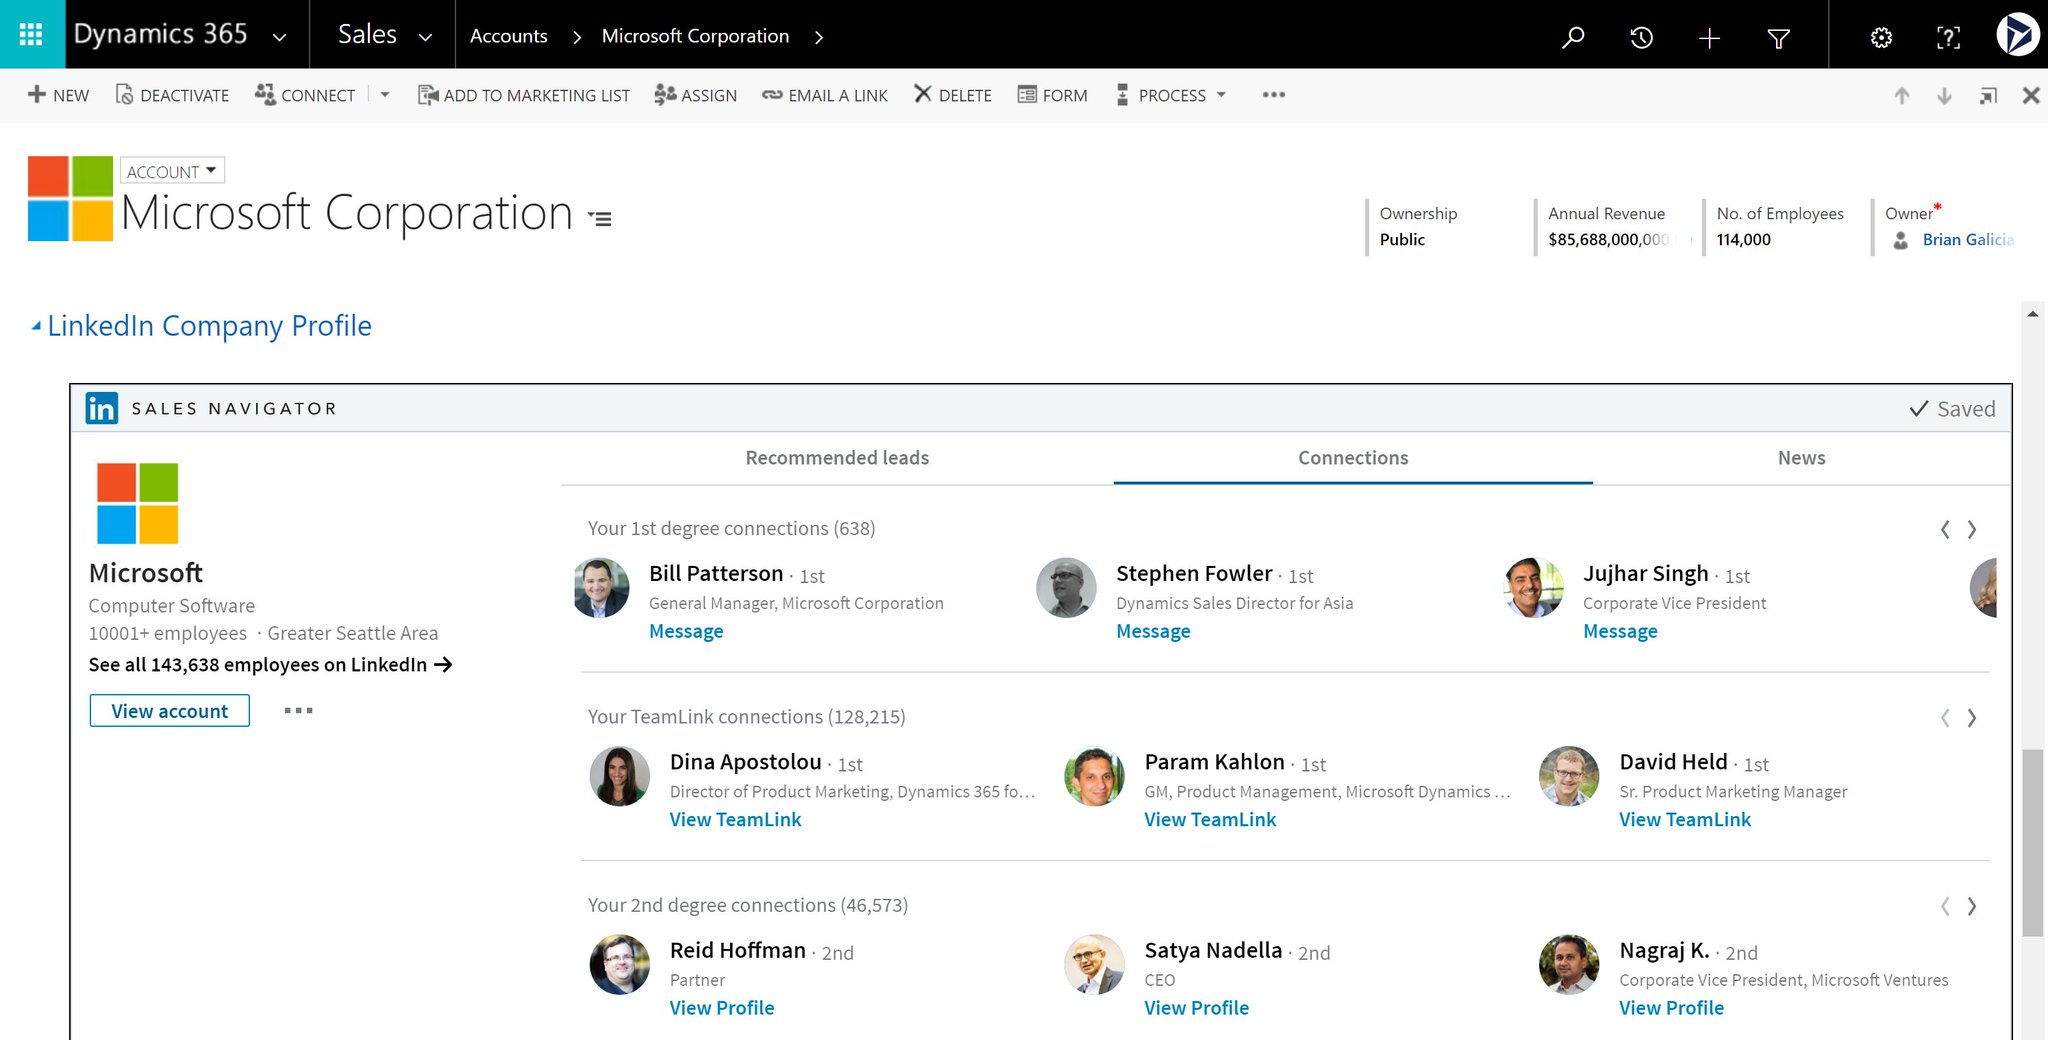 .@eboocock taking the stage https://t.co/ocnybchnLN showcasing LinkedIn and Dynamics #MSBusinessFwd https://t.co/ihFUZ2PSnC